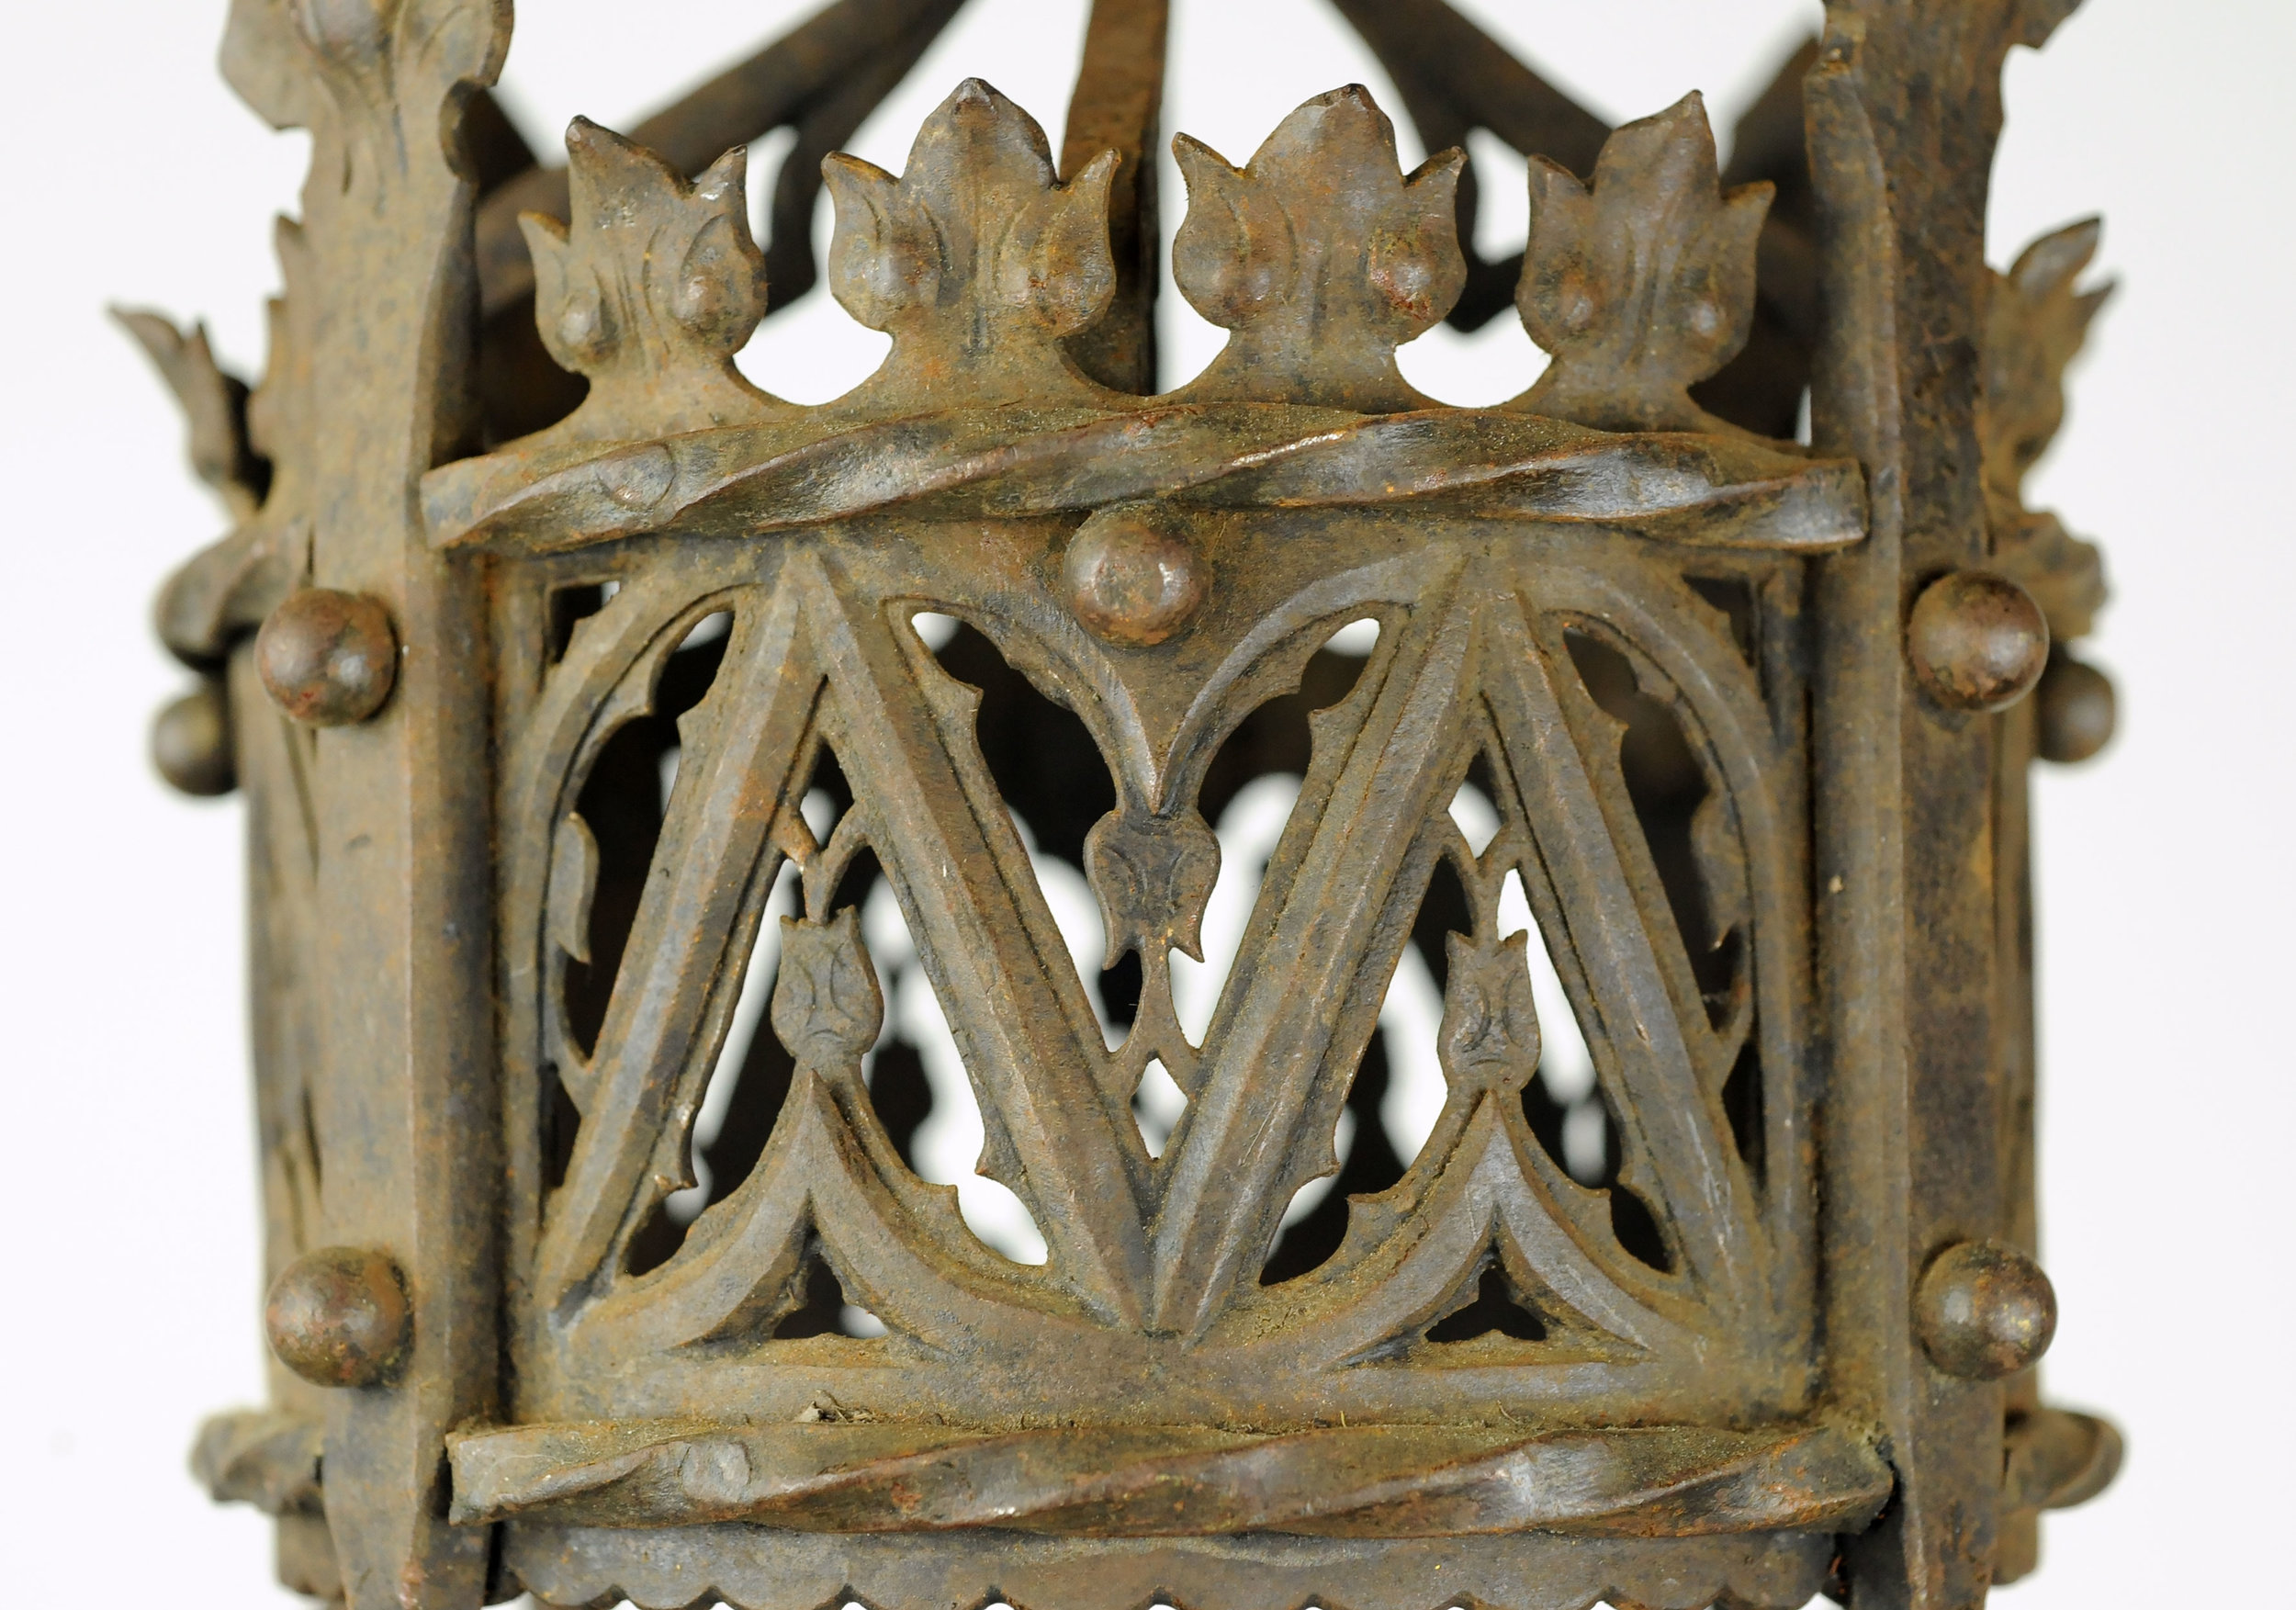 47170-tudor-4-candle-chandelier-metal-detail.jpg